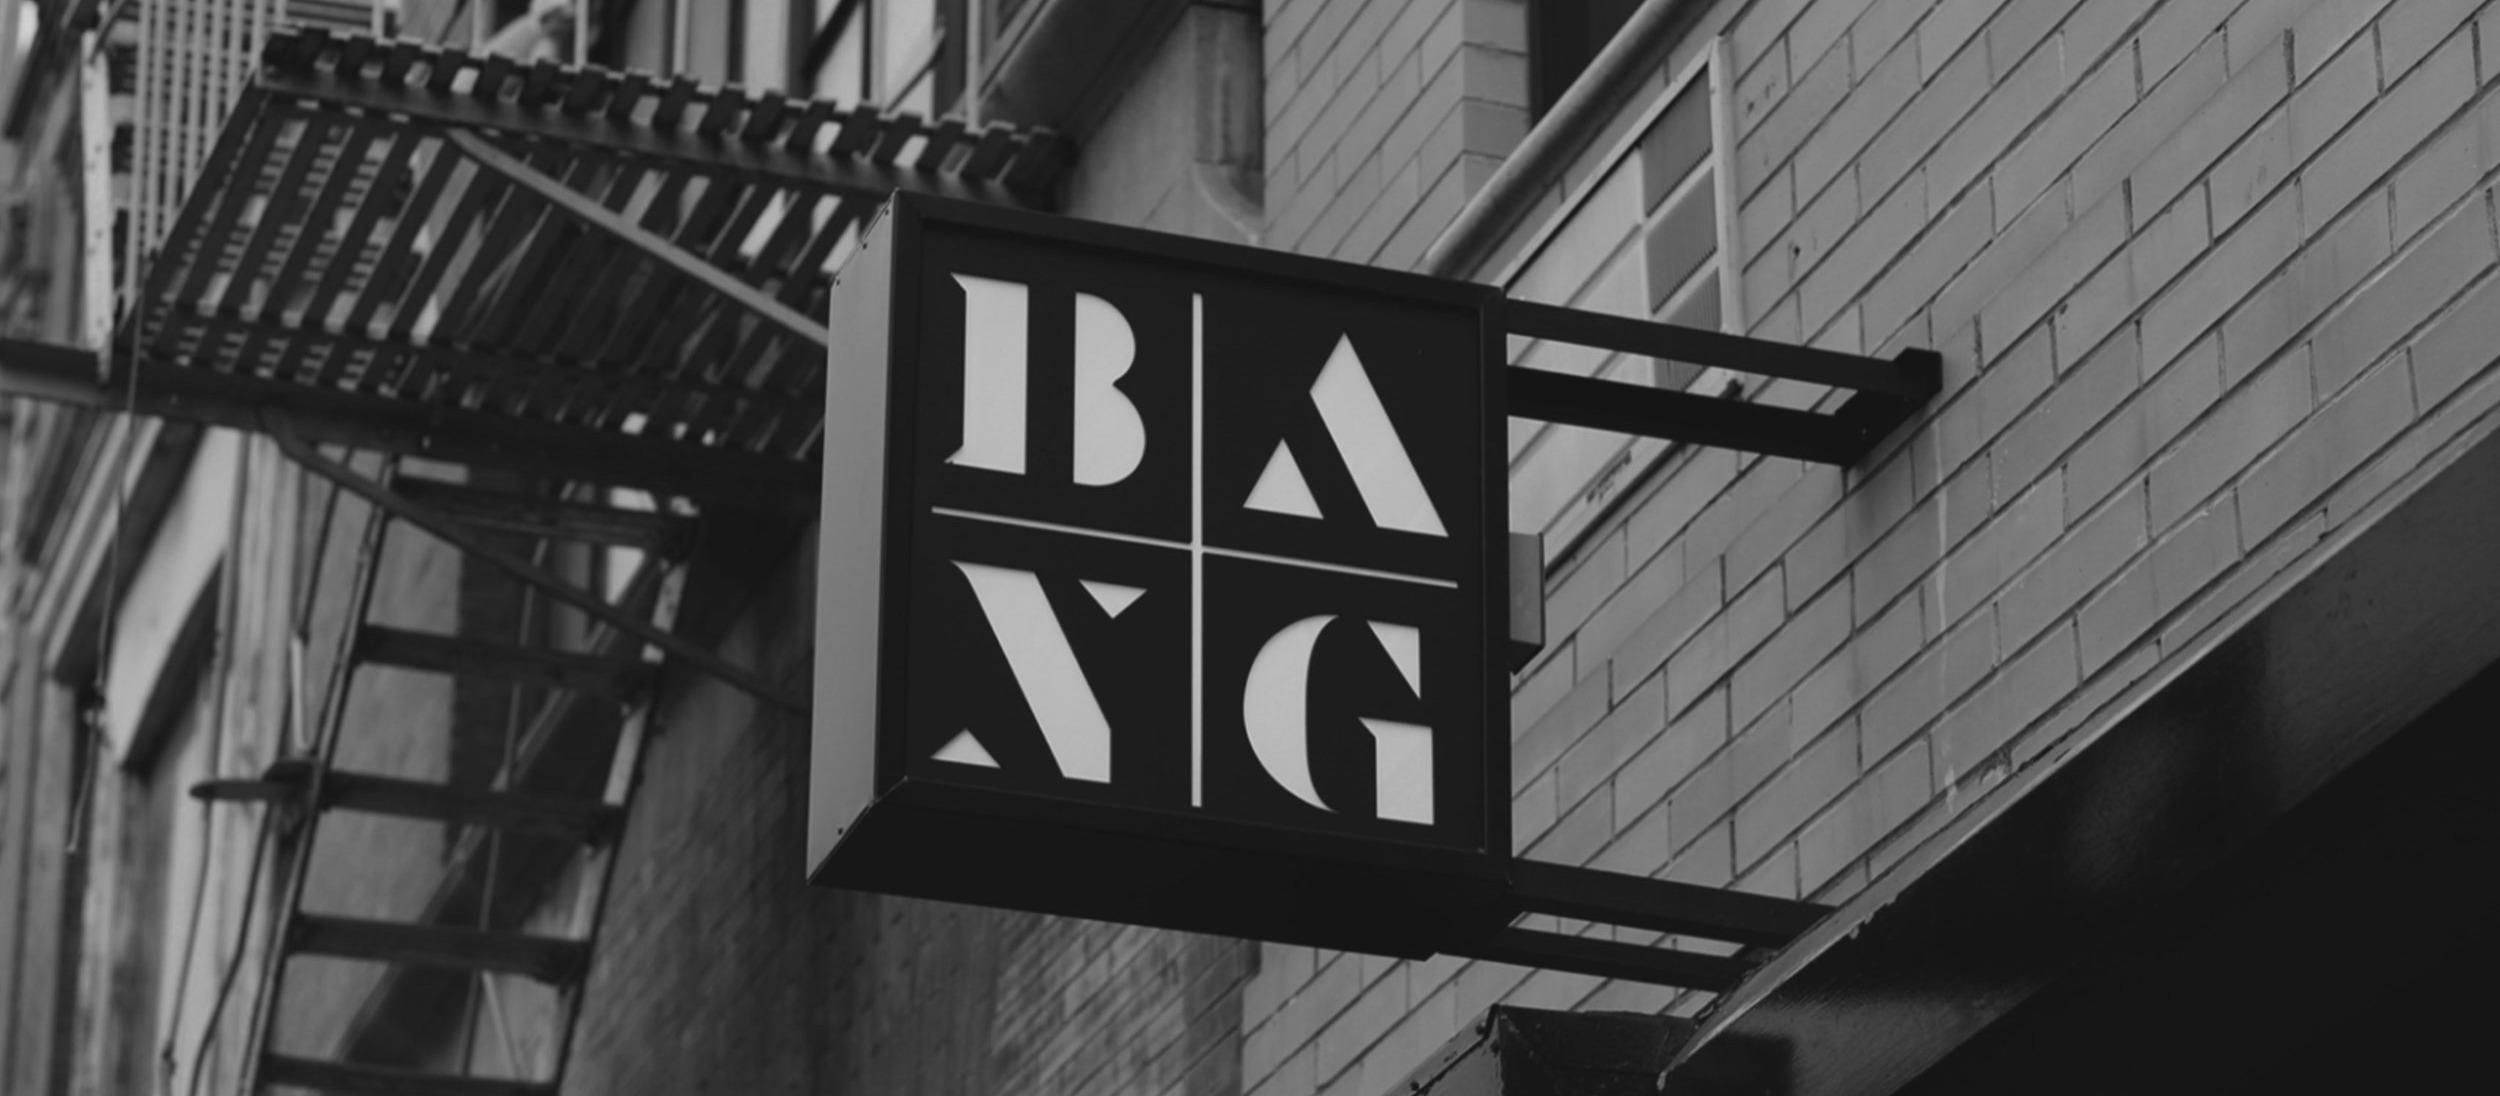 BANG BANG / LE TATOUEUR DES STARS